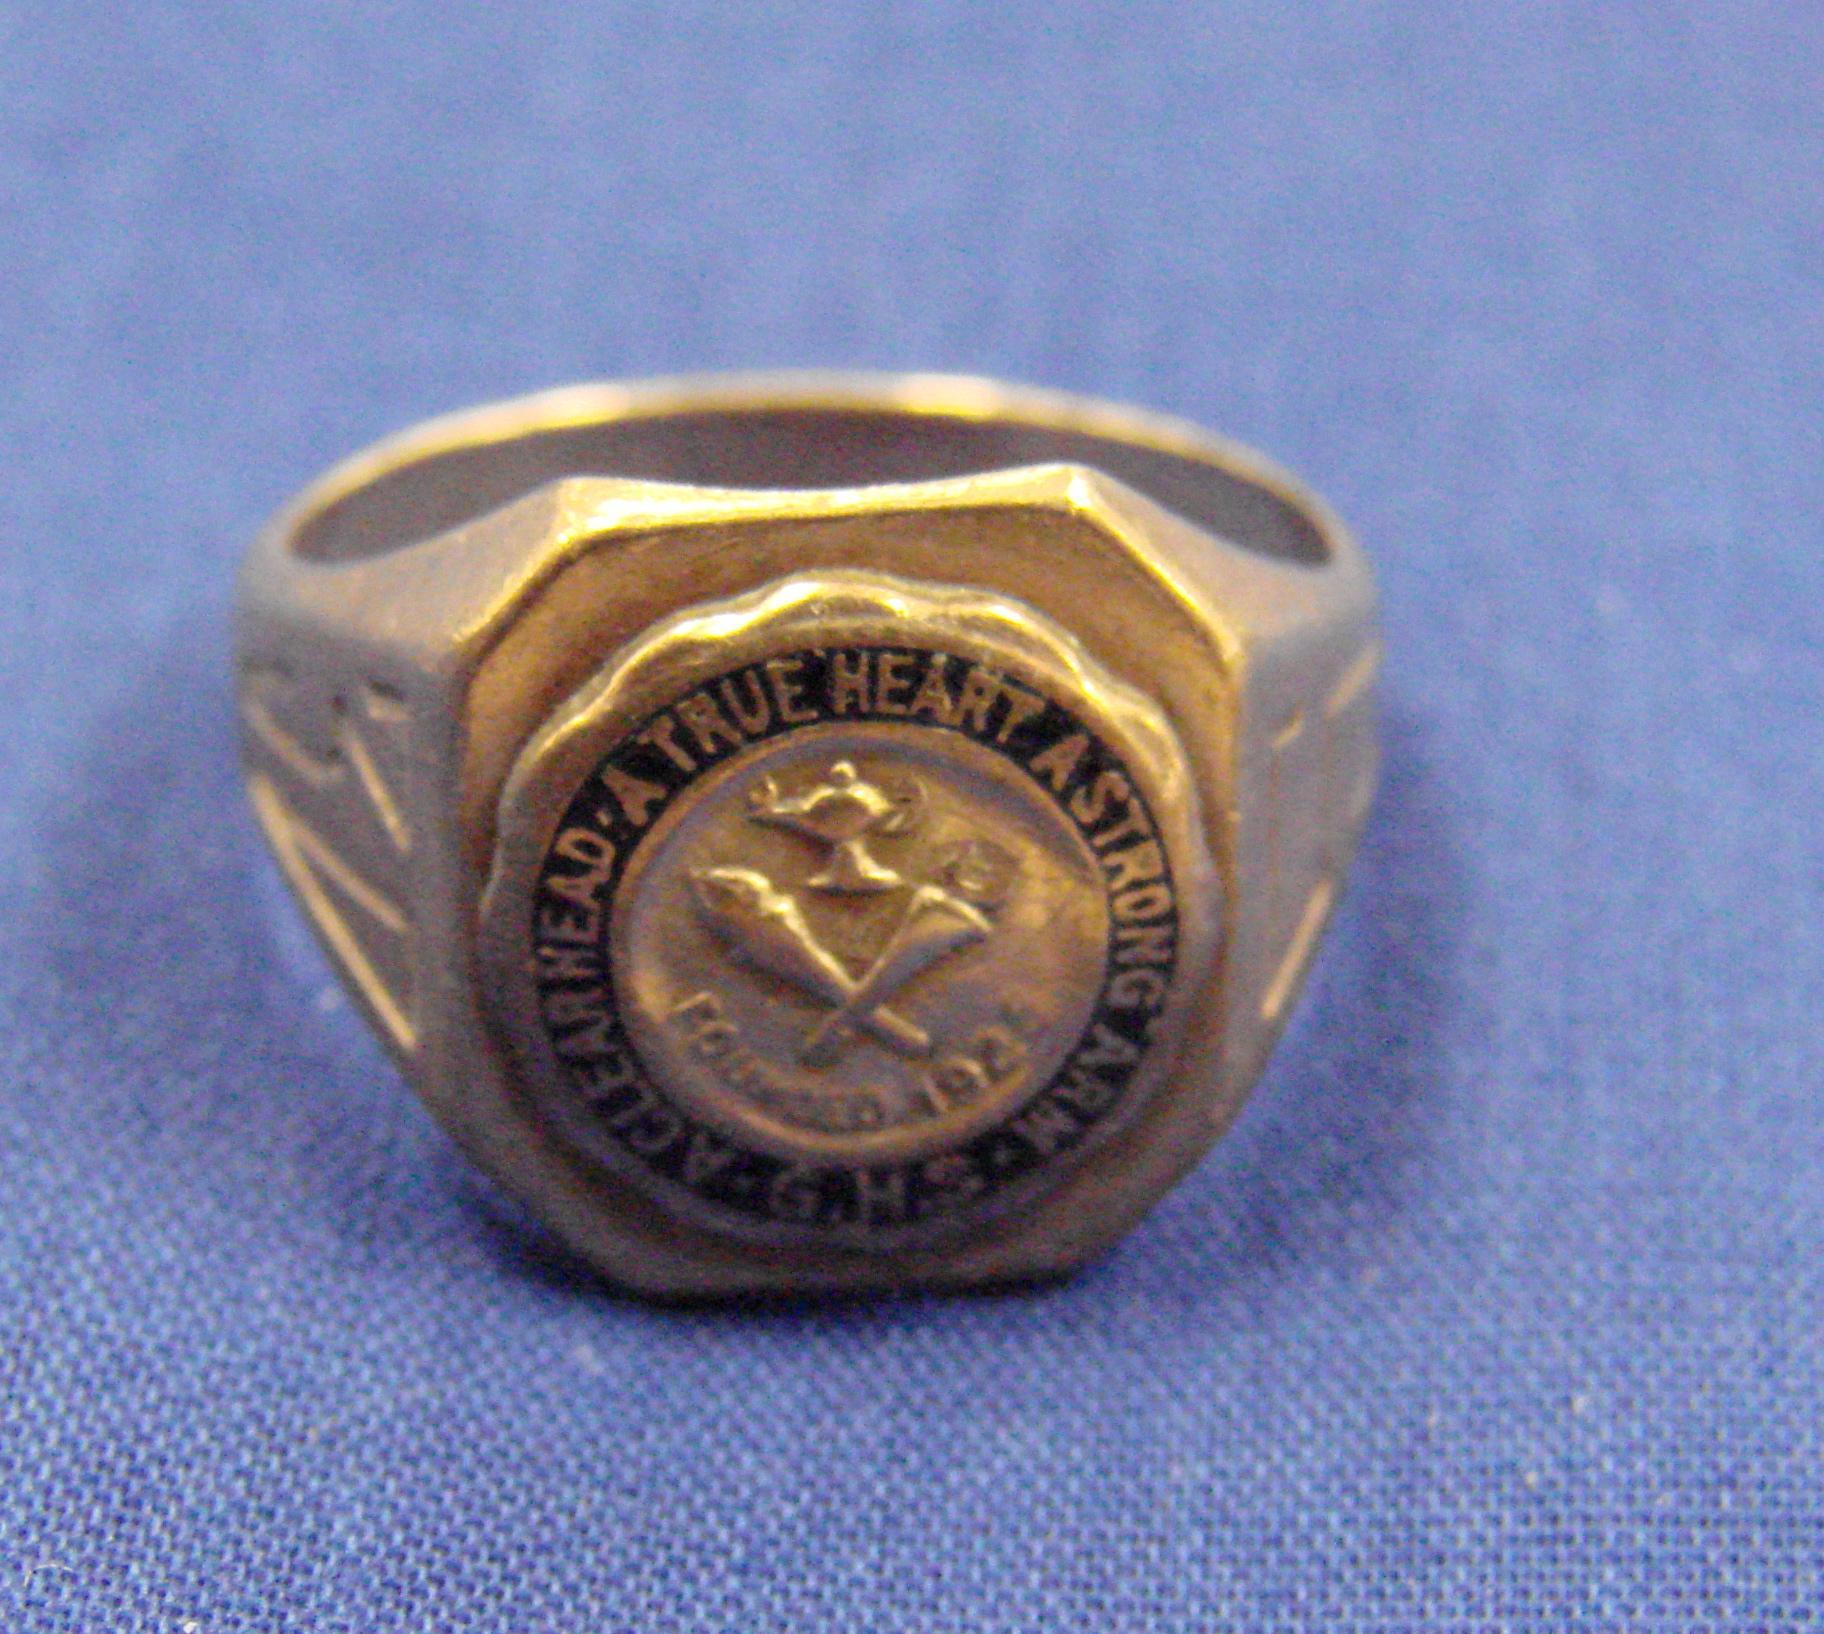 Margaret's class ring